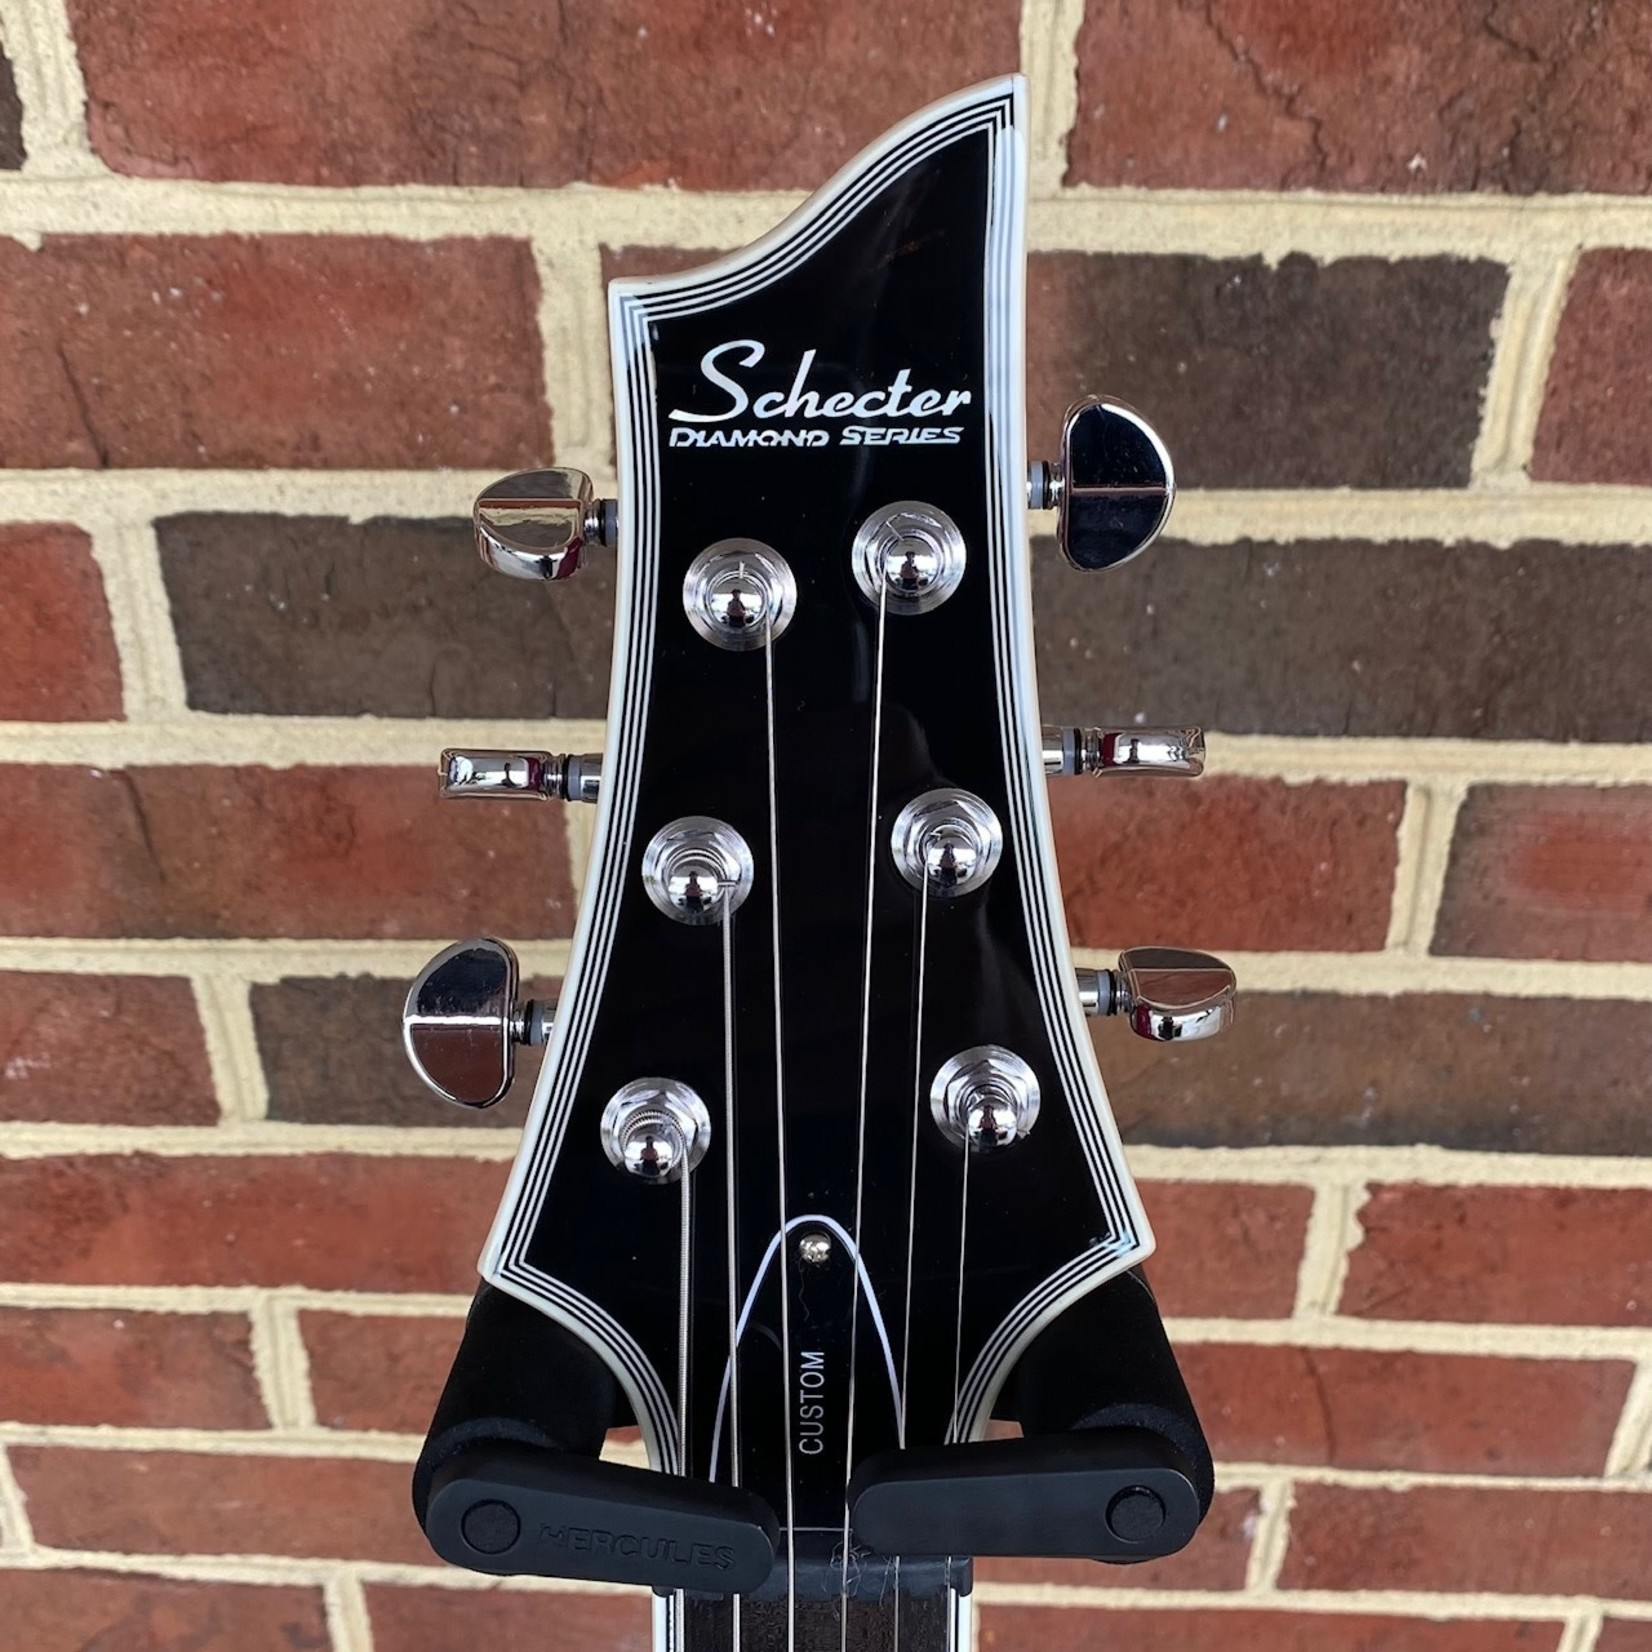 Schecter Guitar Research Schecter V-1 Custom, Trans Purple, Flame Maple Top, Ebony Fretboard, Block Inlays, Locking Tuners